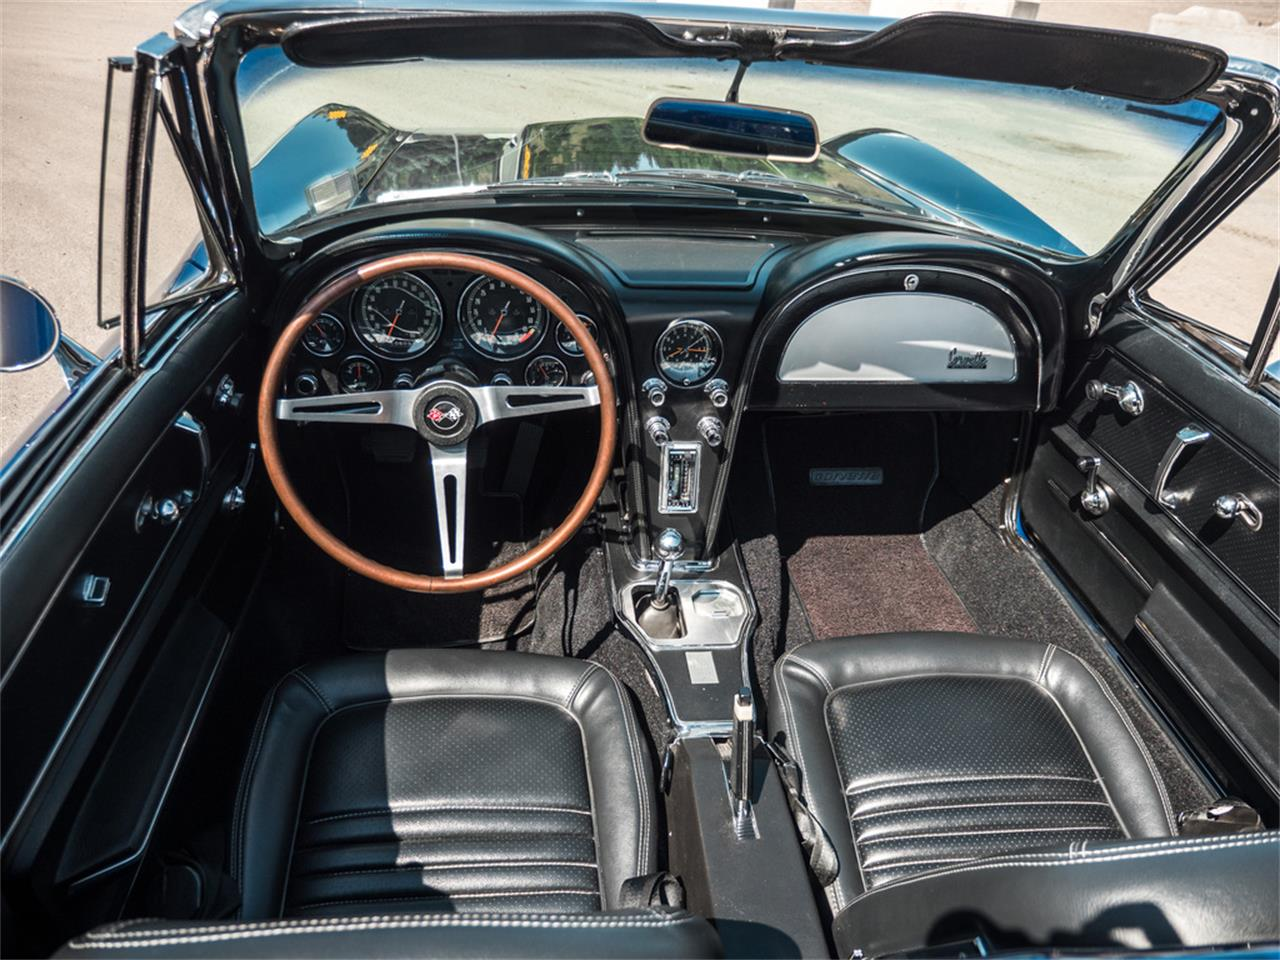 Large Picture of Classic '67 Corvette located in Kelowna British Columbia - $107,123.00 - QH6N